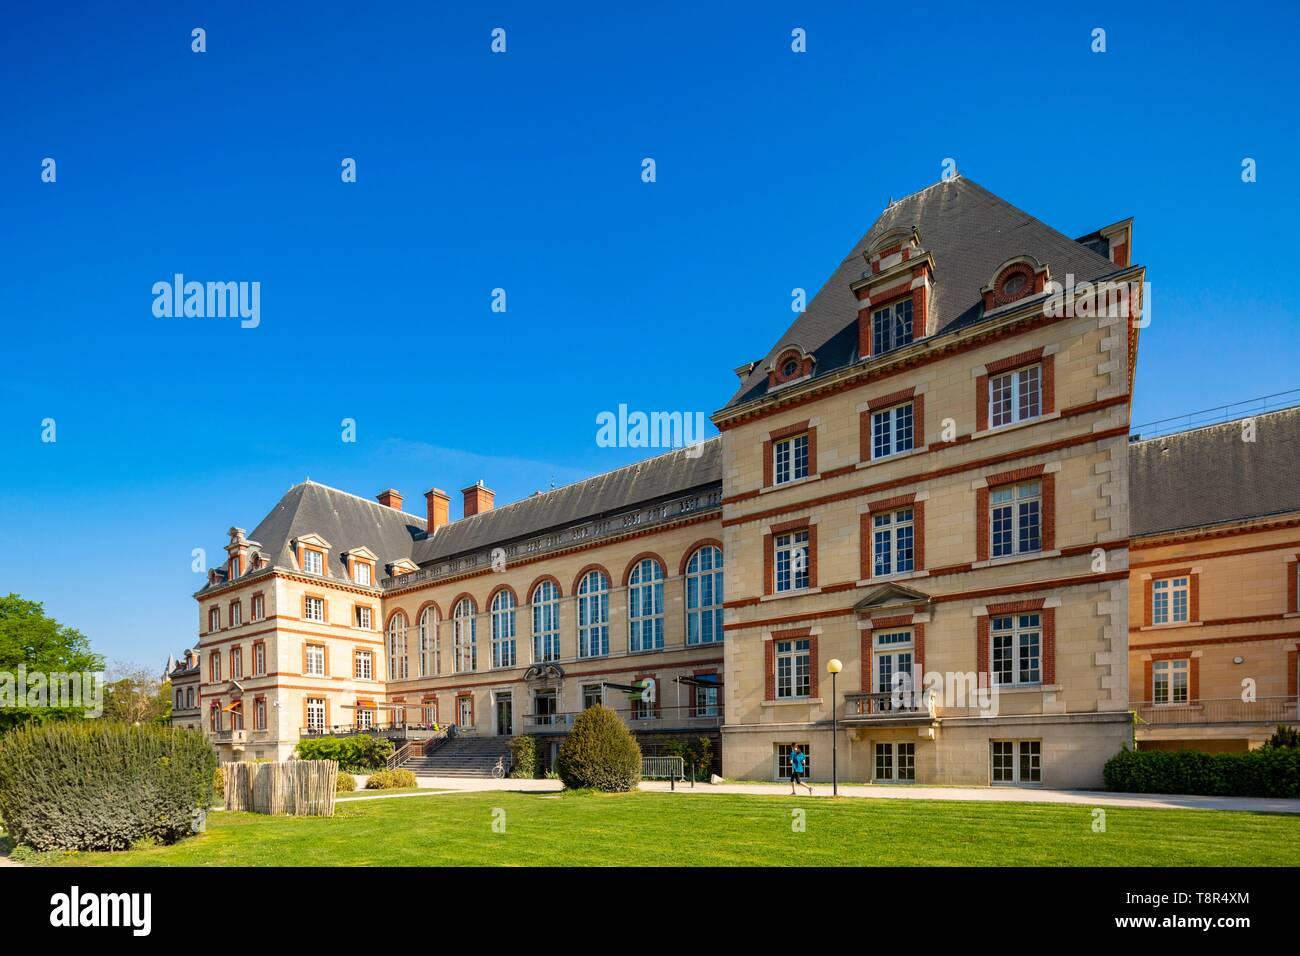 France, Paris, the University City - Stock Image